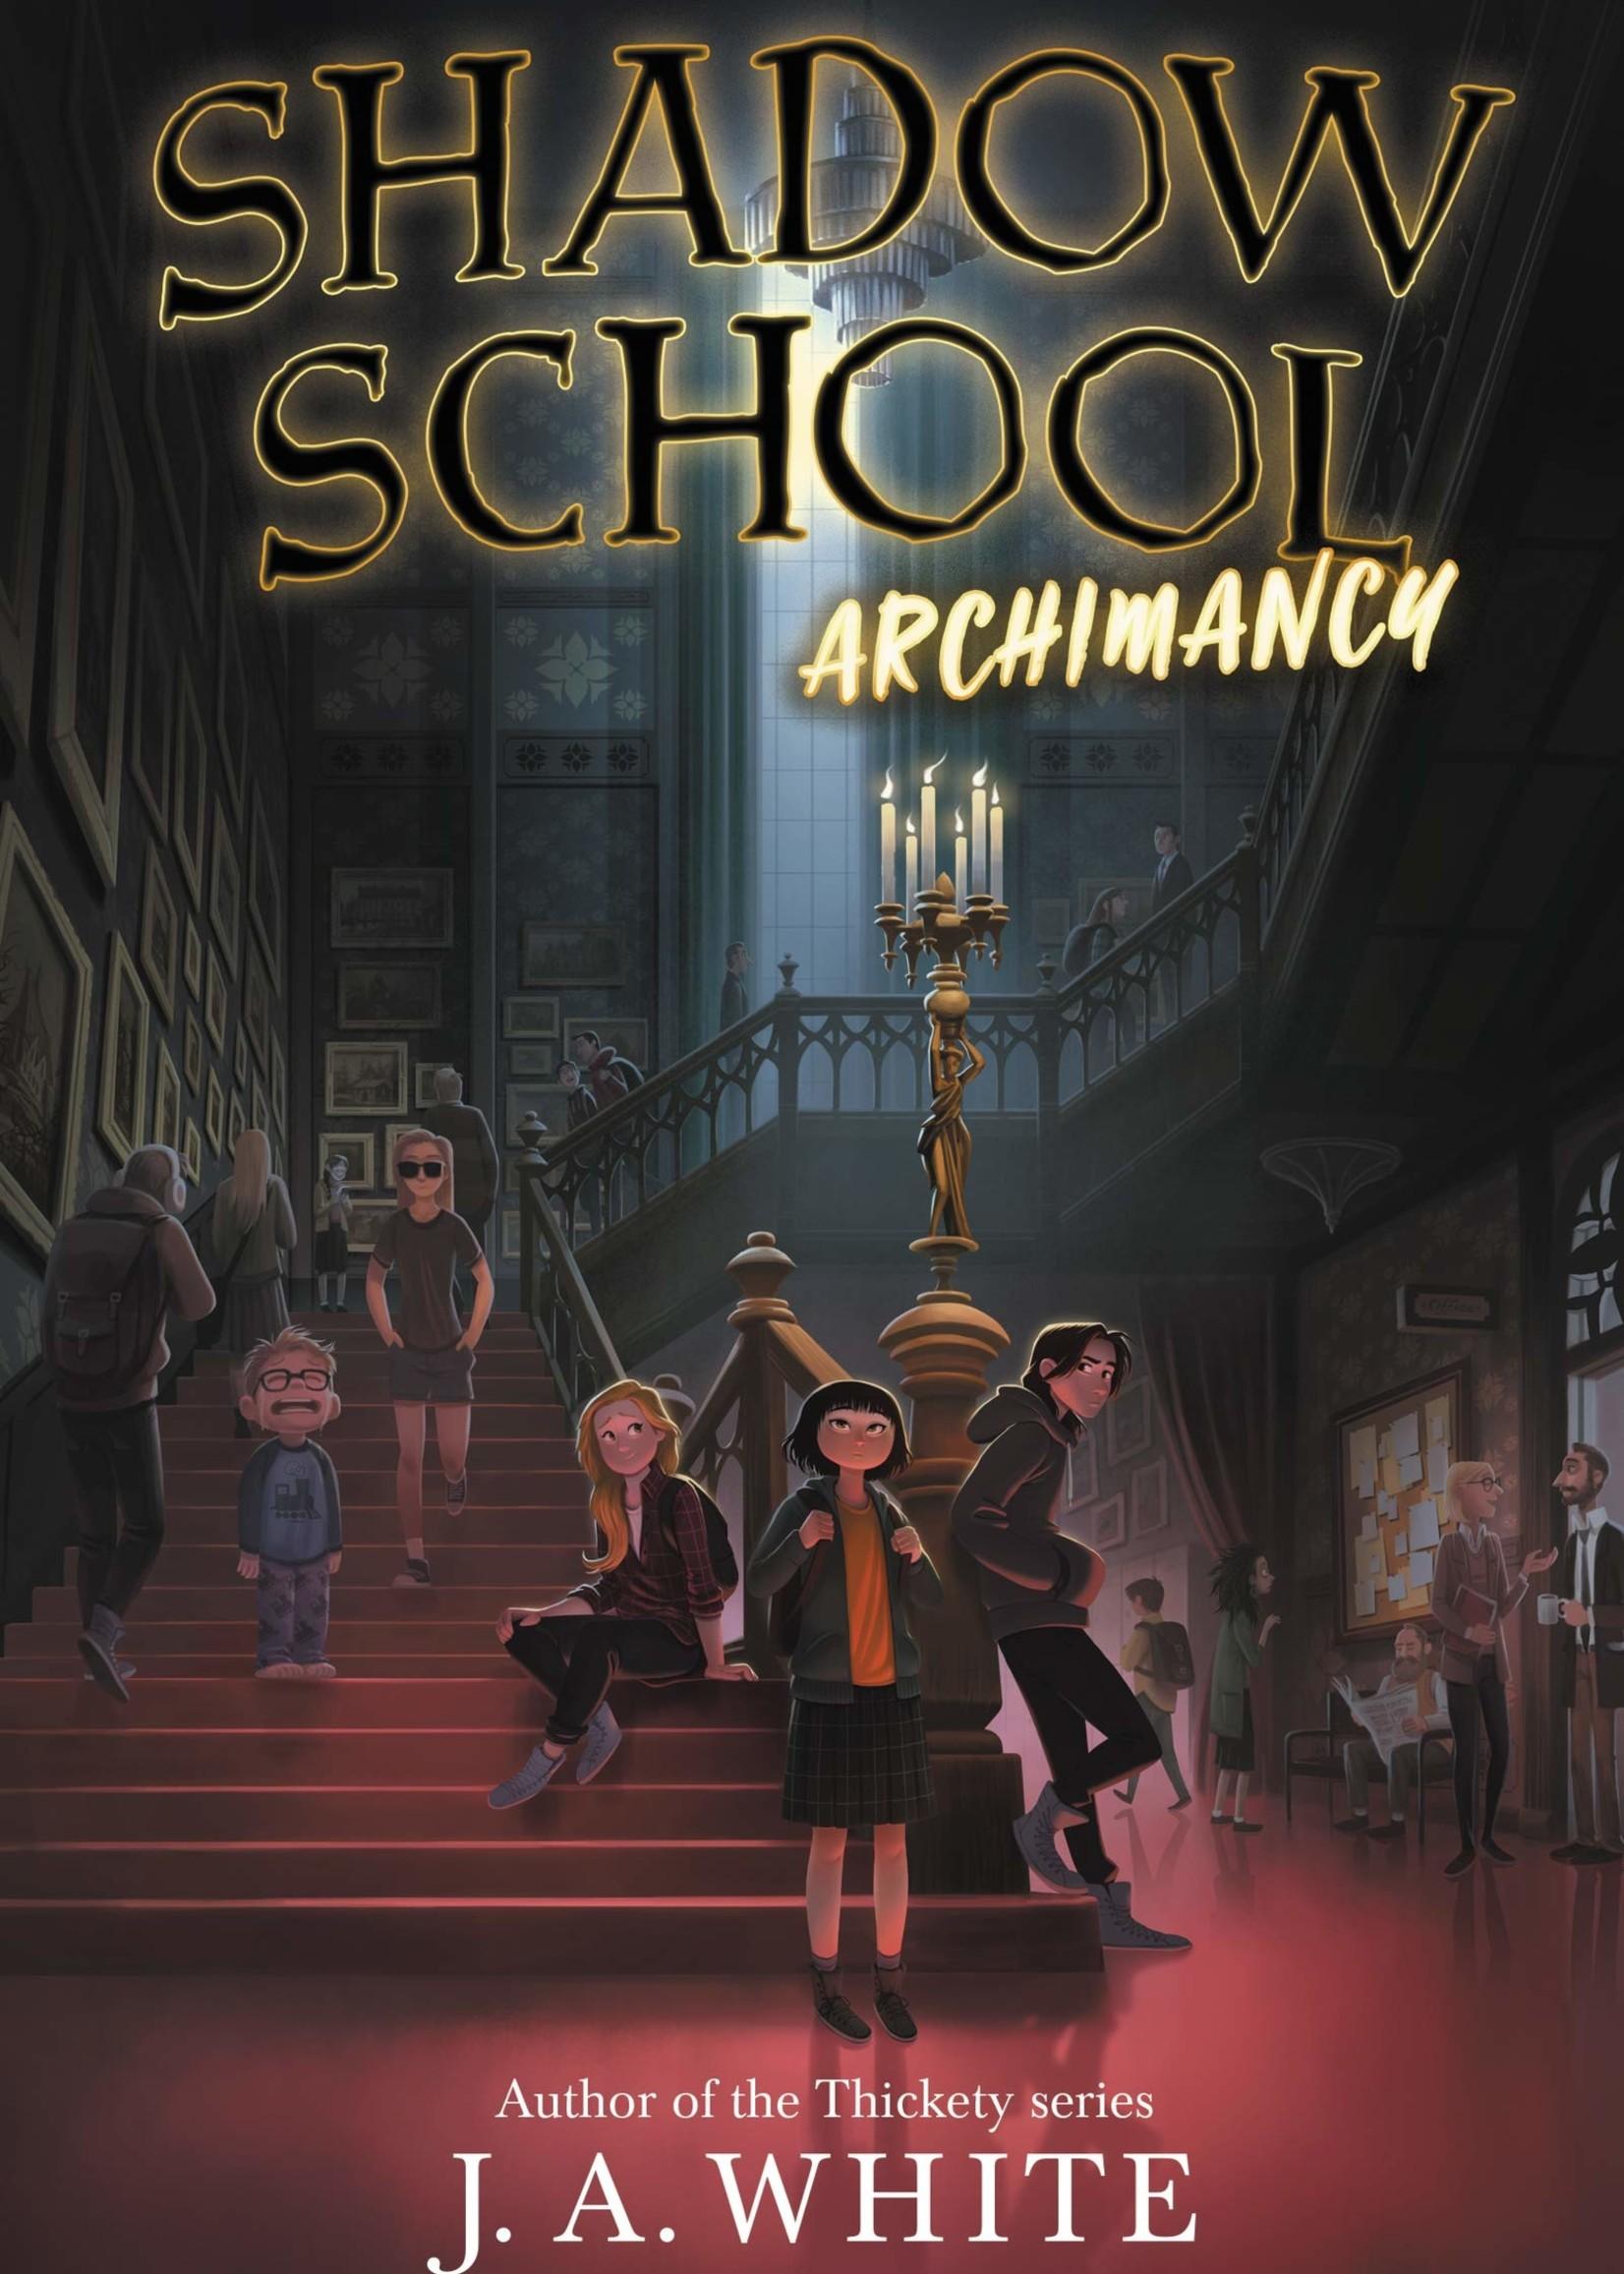 OBOB 21/22: Shadow School #01,  Archimancy - Paperback